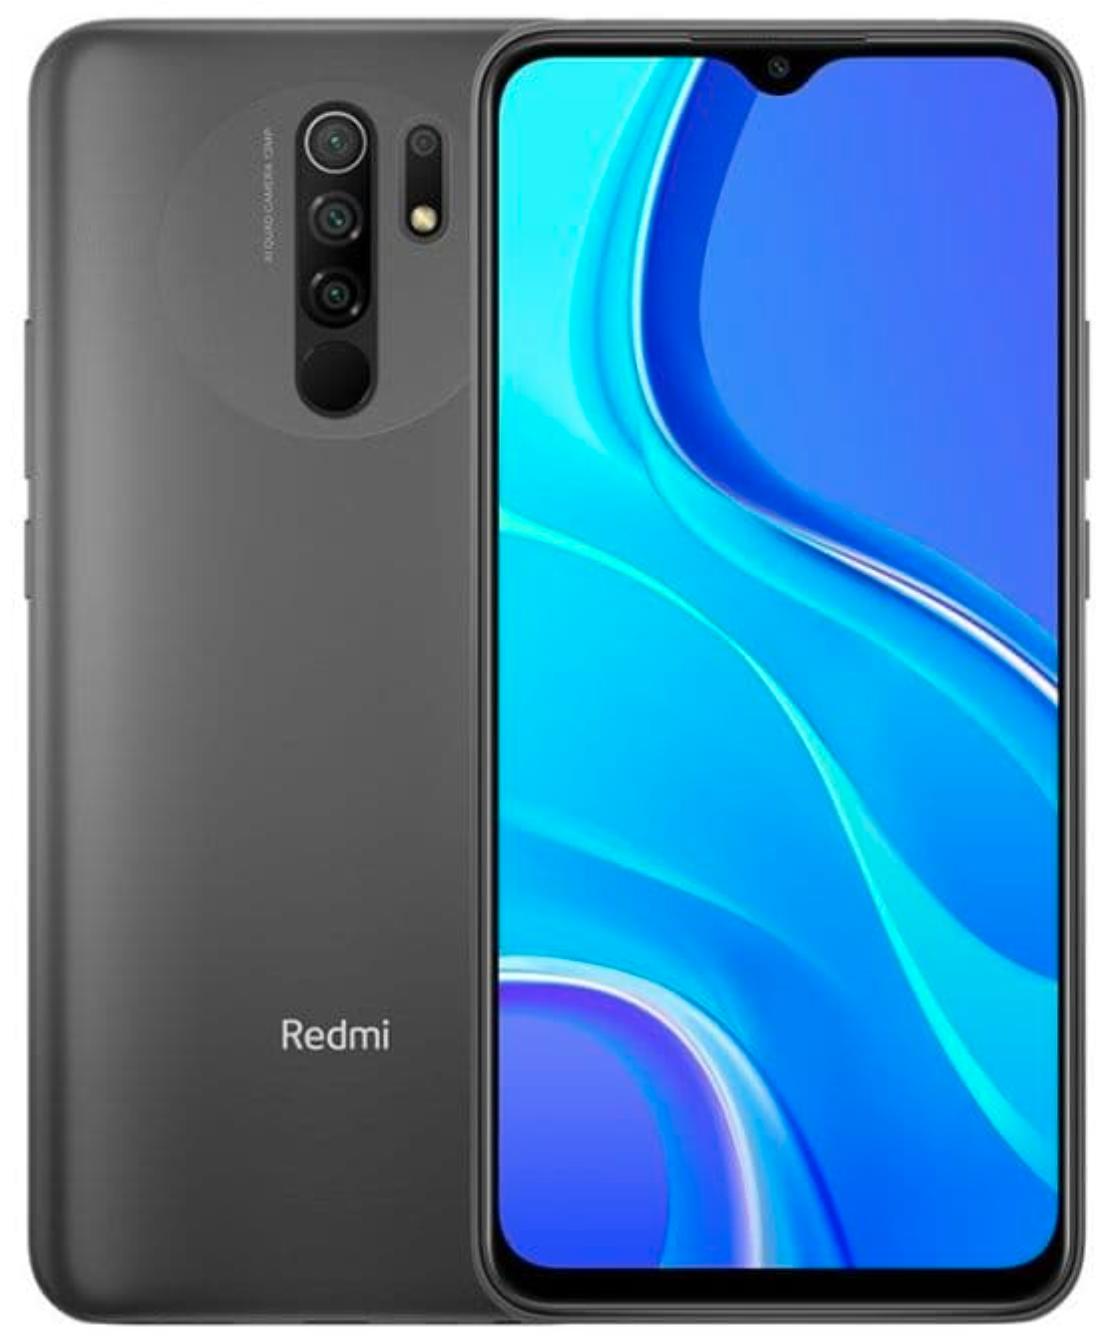 "Smartphone 6.53"" Xiaomi redmi 9 - 64 Go"